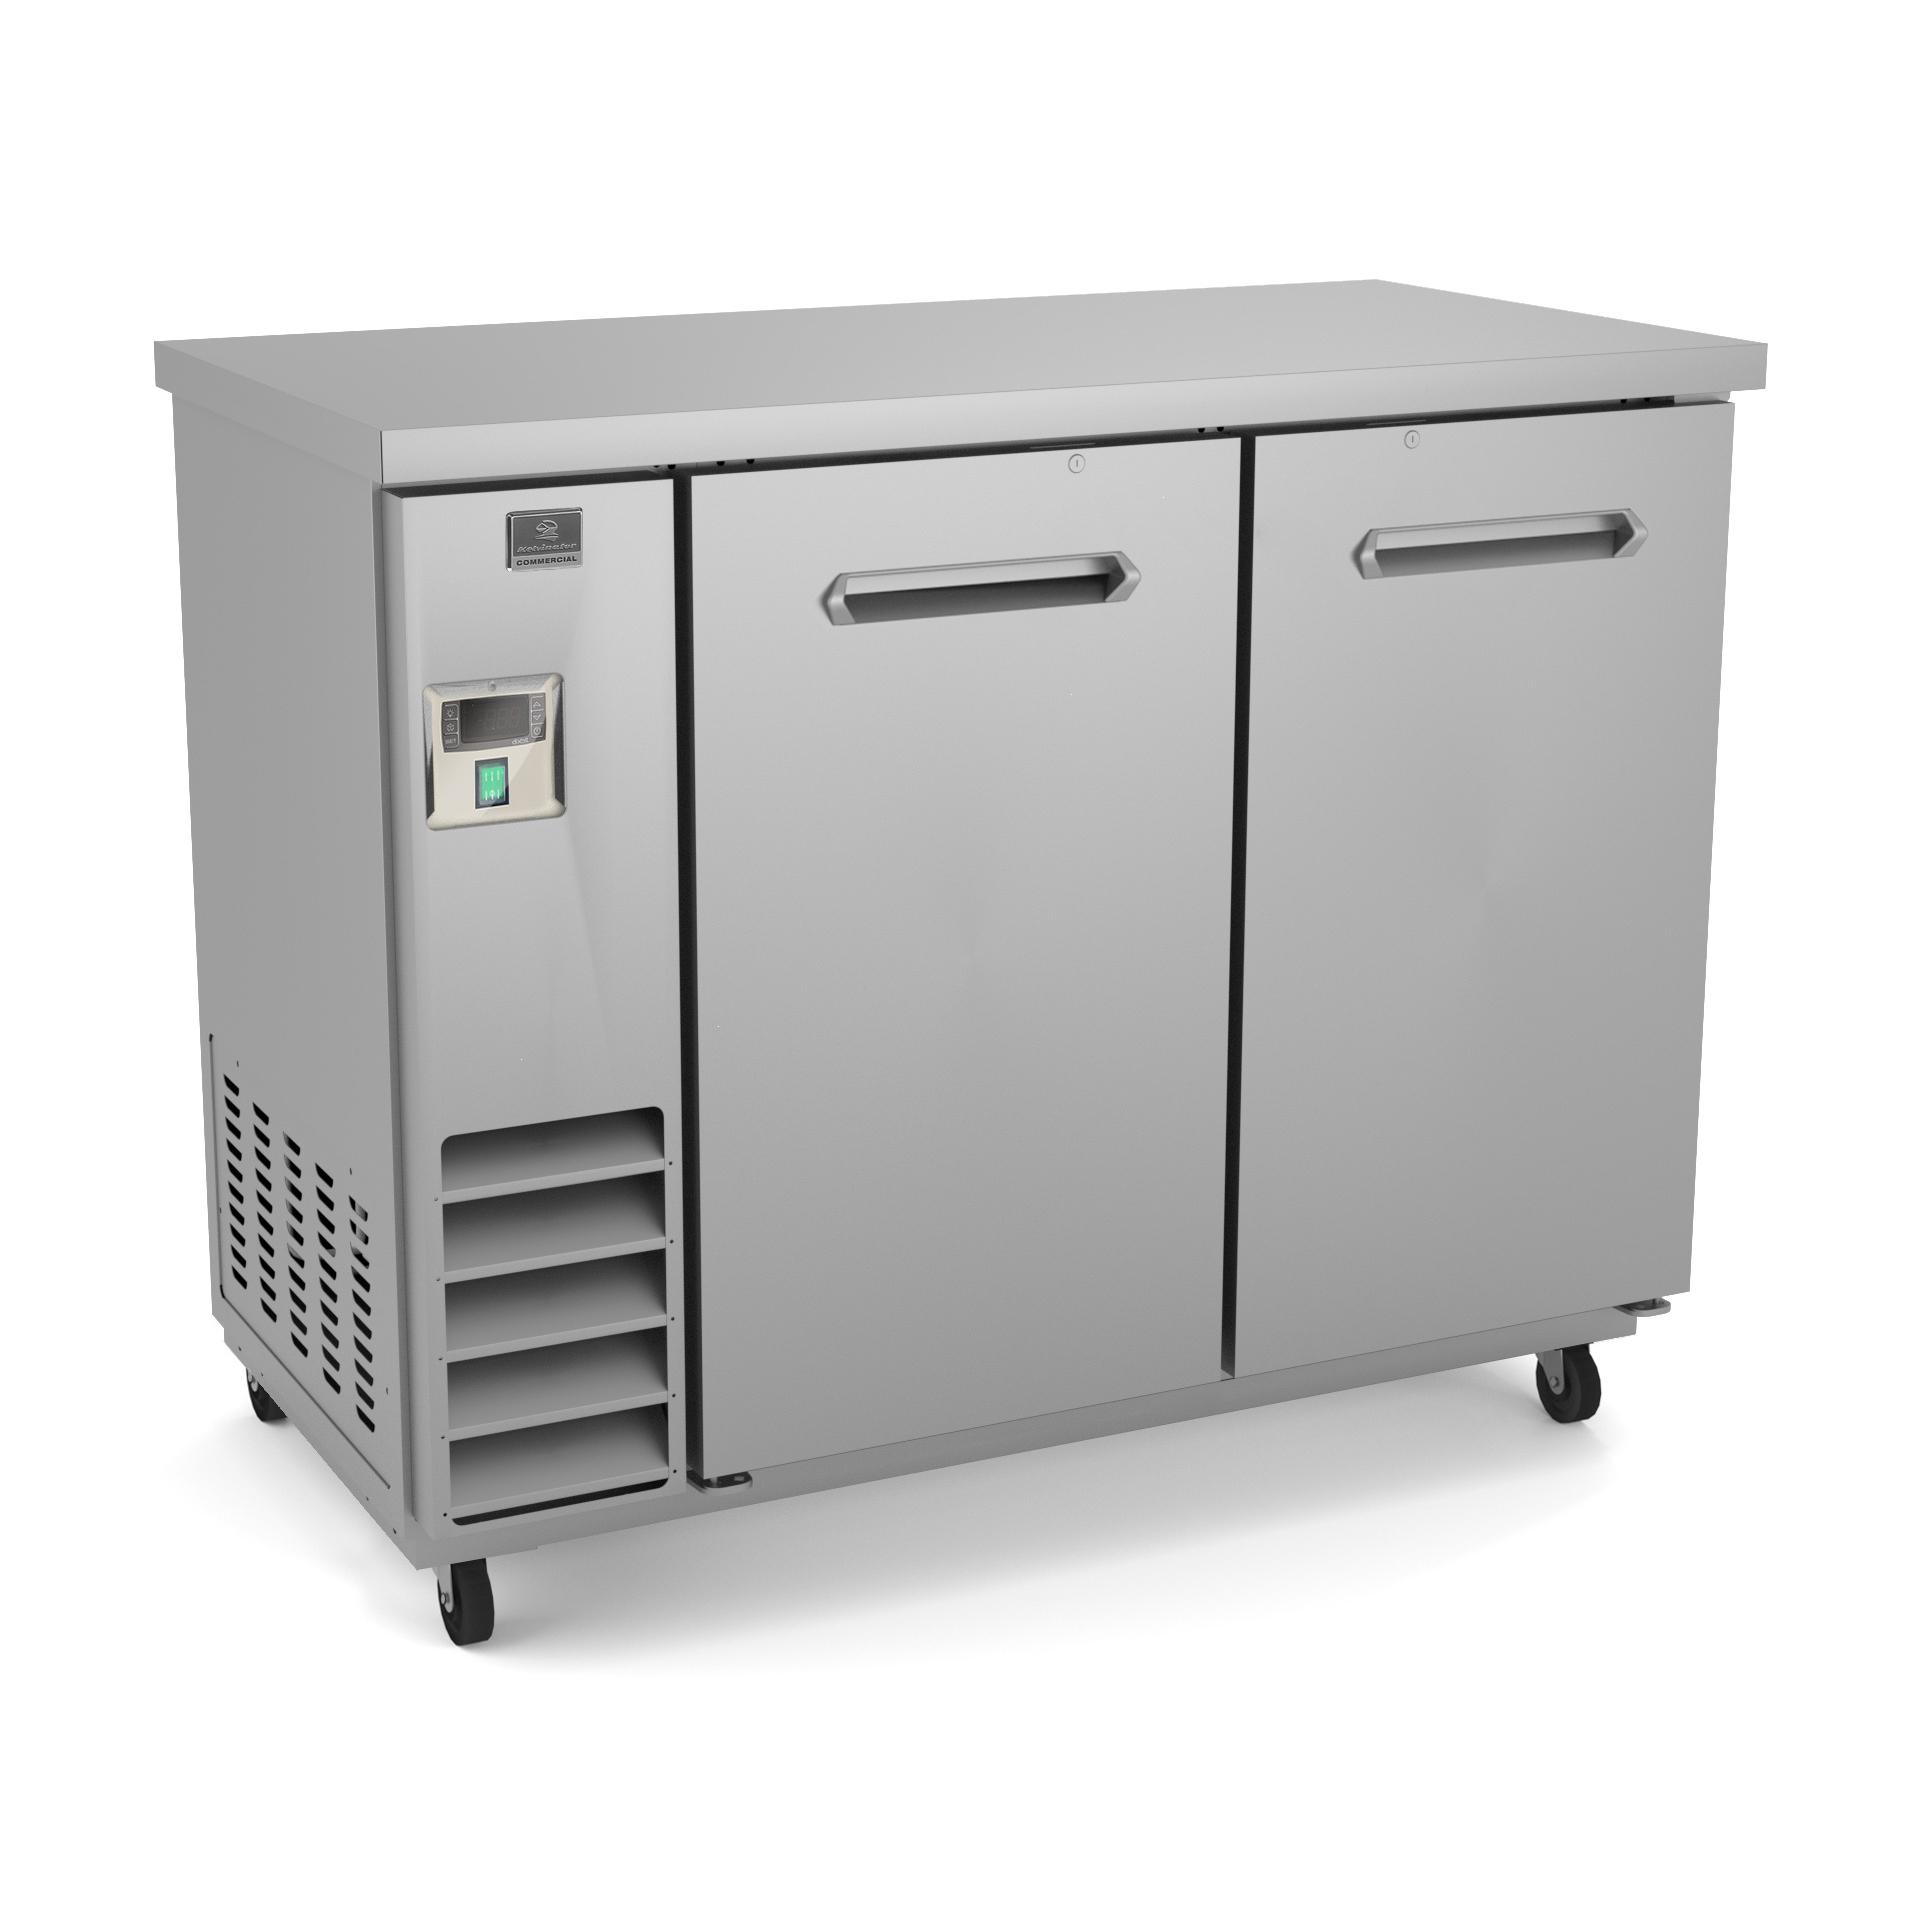 Kelvinator Commercial KCHBB48SS back bar cabinet, refrigerated